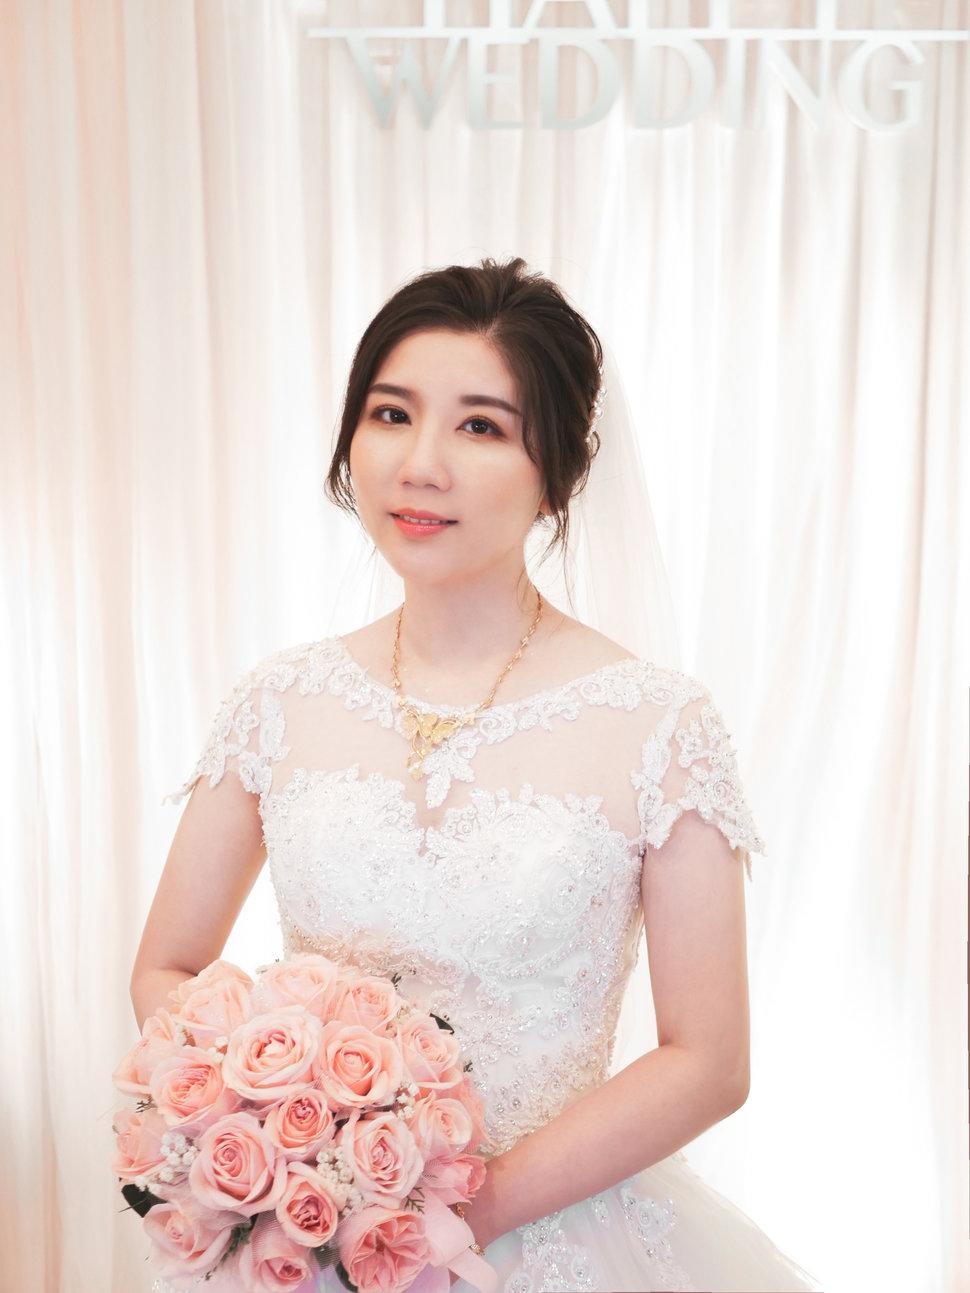 7A6BC92A-4CC5-43F8-955A-C1E68B39DFC0 - Lulu盧葦青《結婚吧》